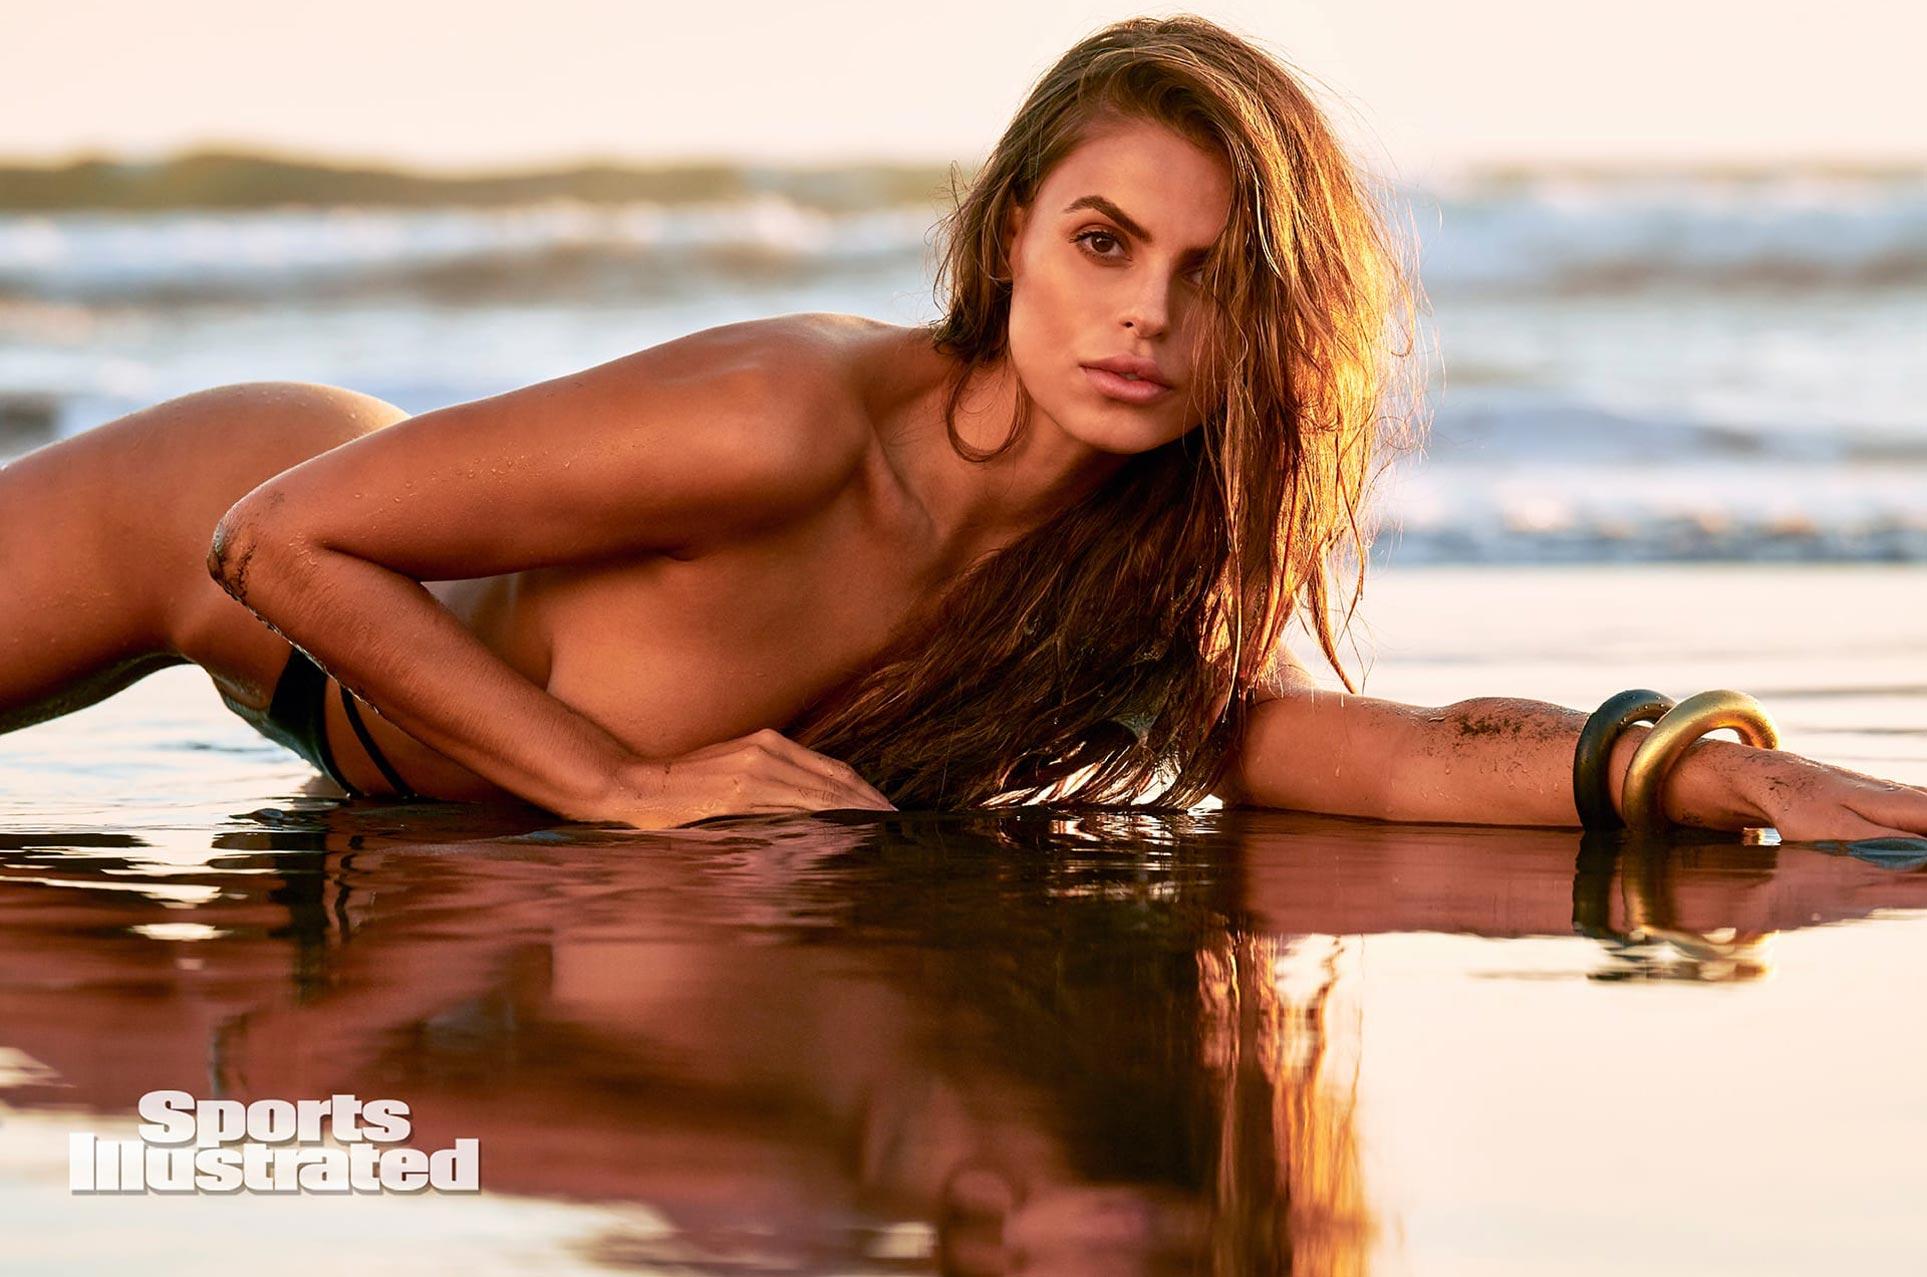 Брукс Надер в каталоге купальников Sports Illustrated Swimsuit 2020 / фото 22